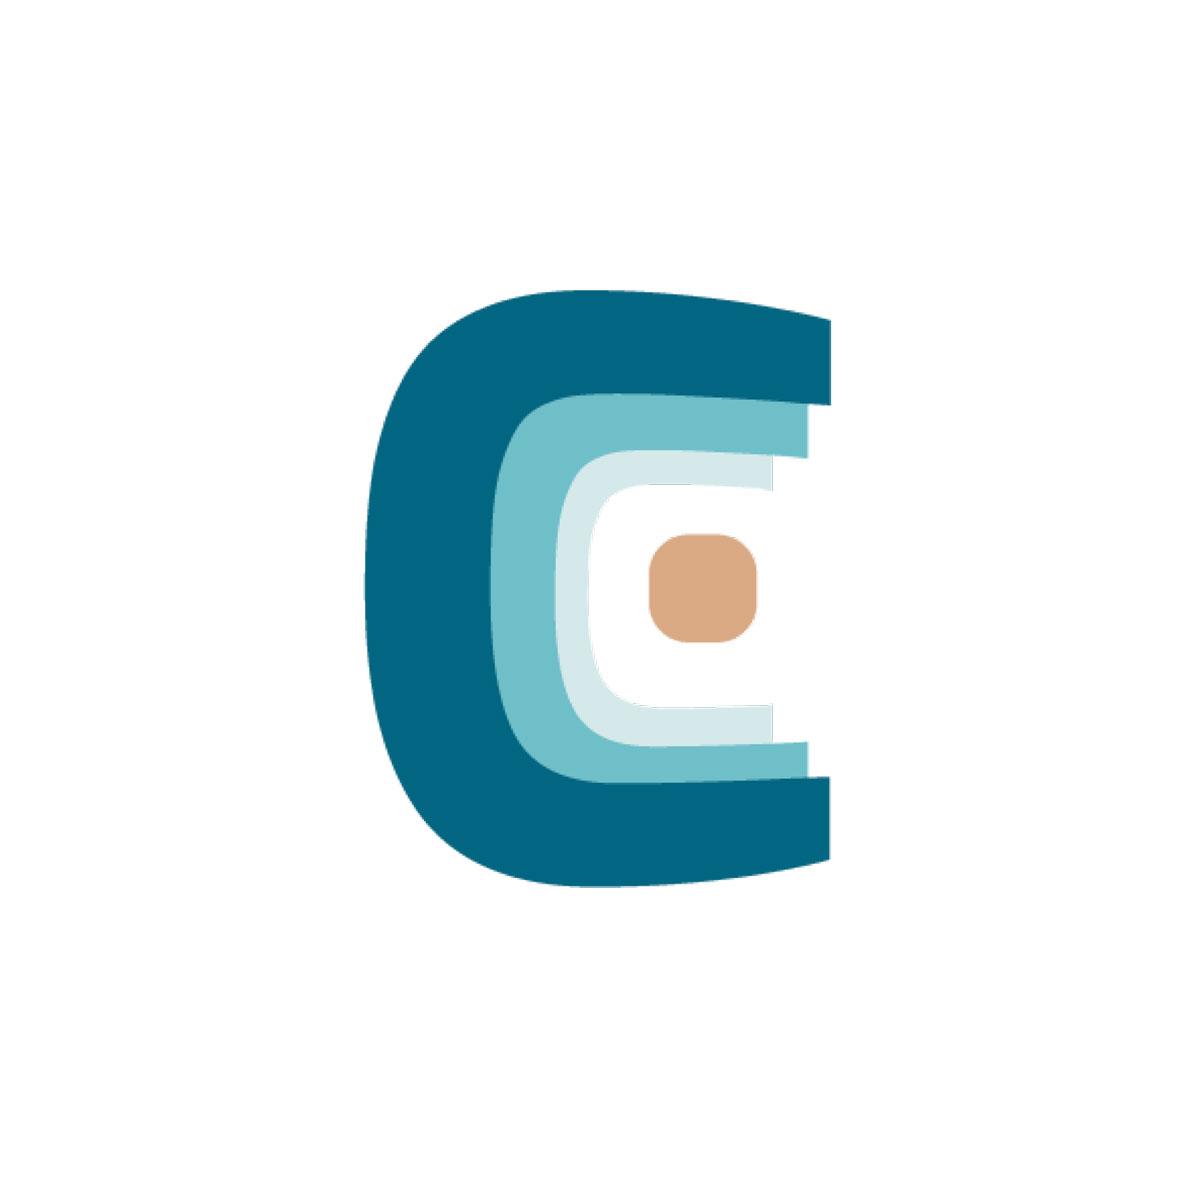 colisee-espaces-brandbook-charte-graphique-2